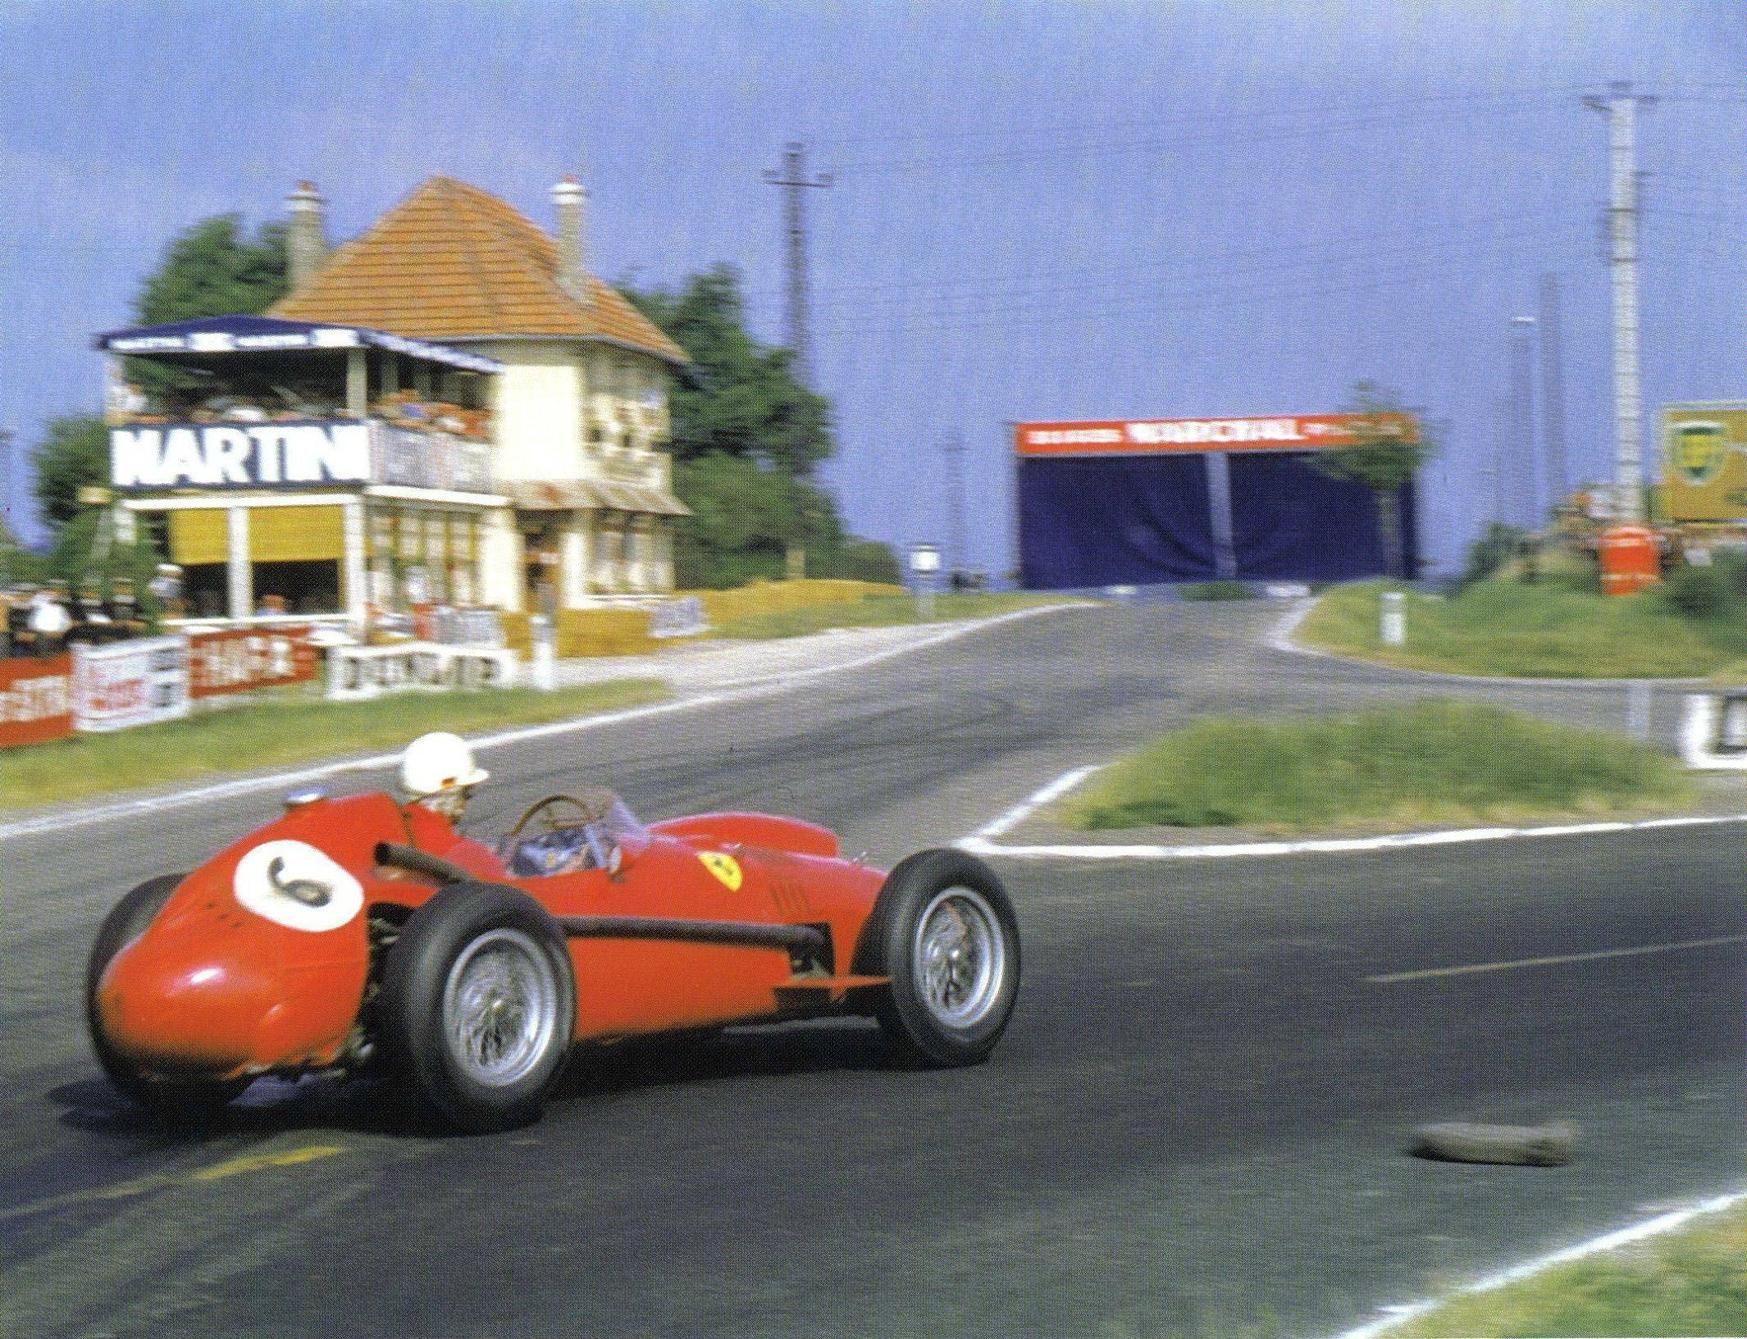 1958 gp francji reims ferrari 246 wolfgang von trips grand prix racing early days to 1950. Black Bedroom Furniture Sets. Home Design Ideas